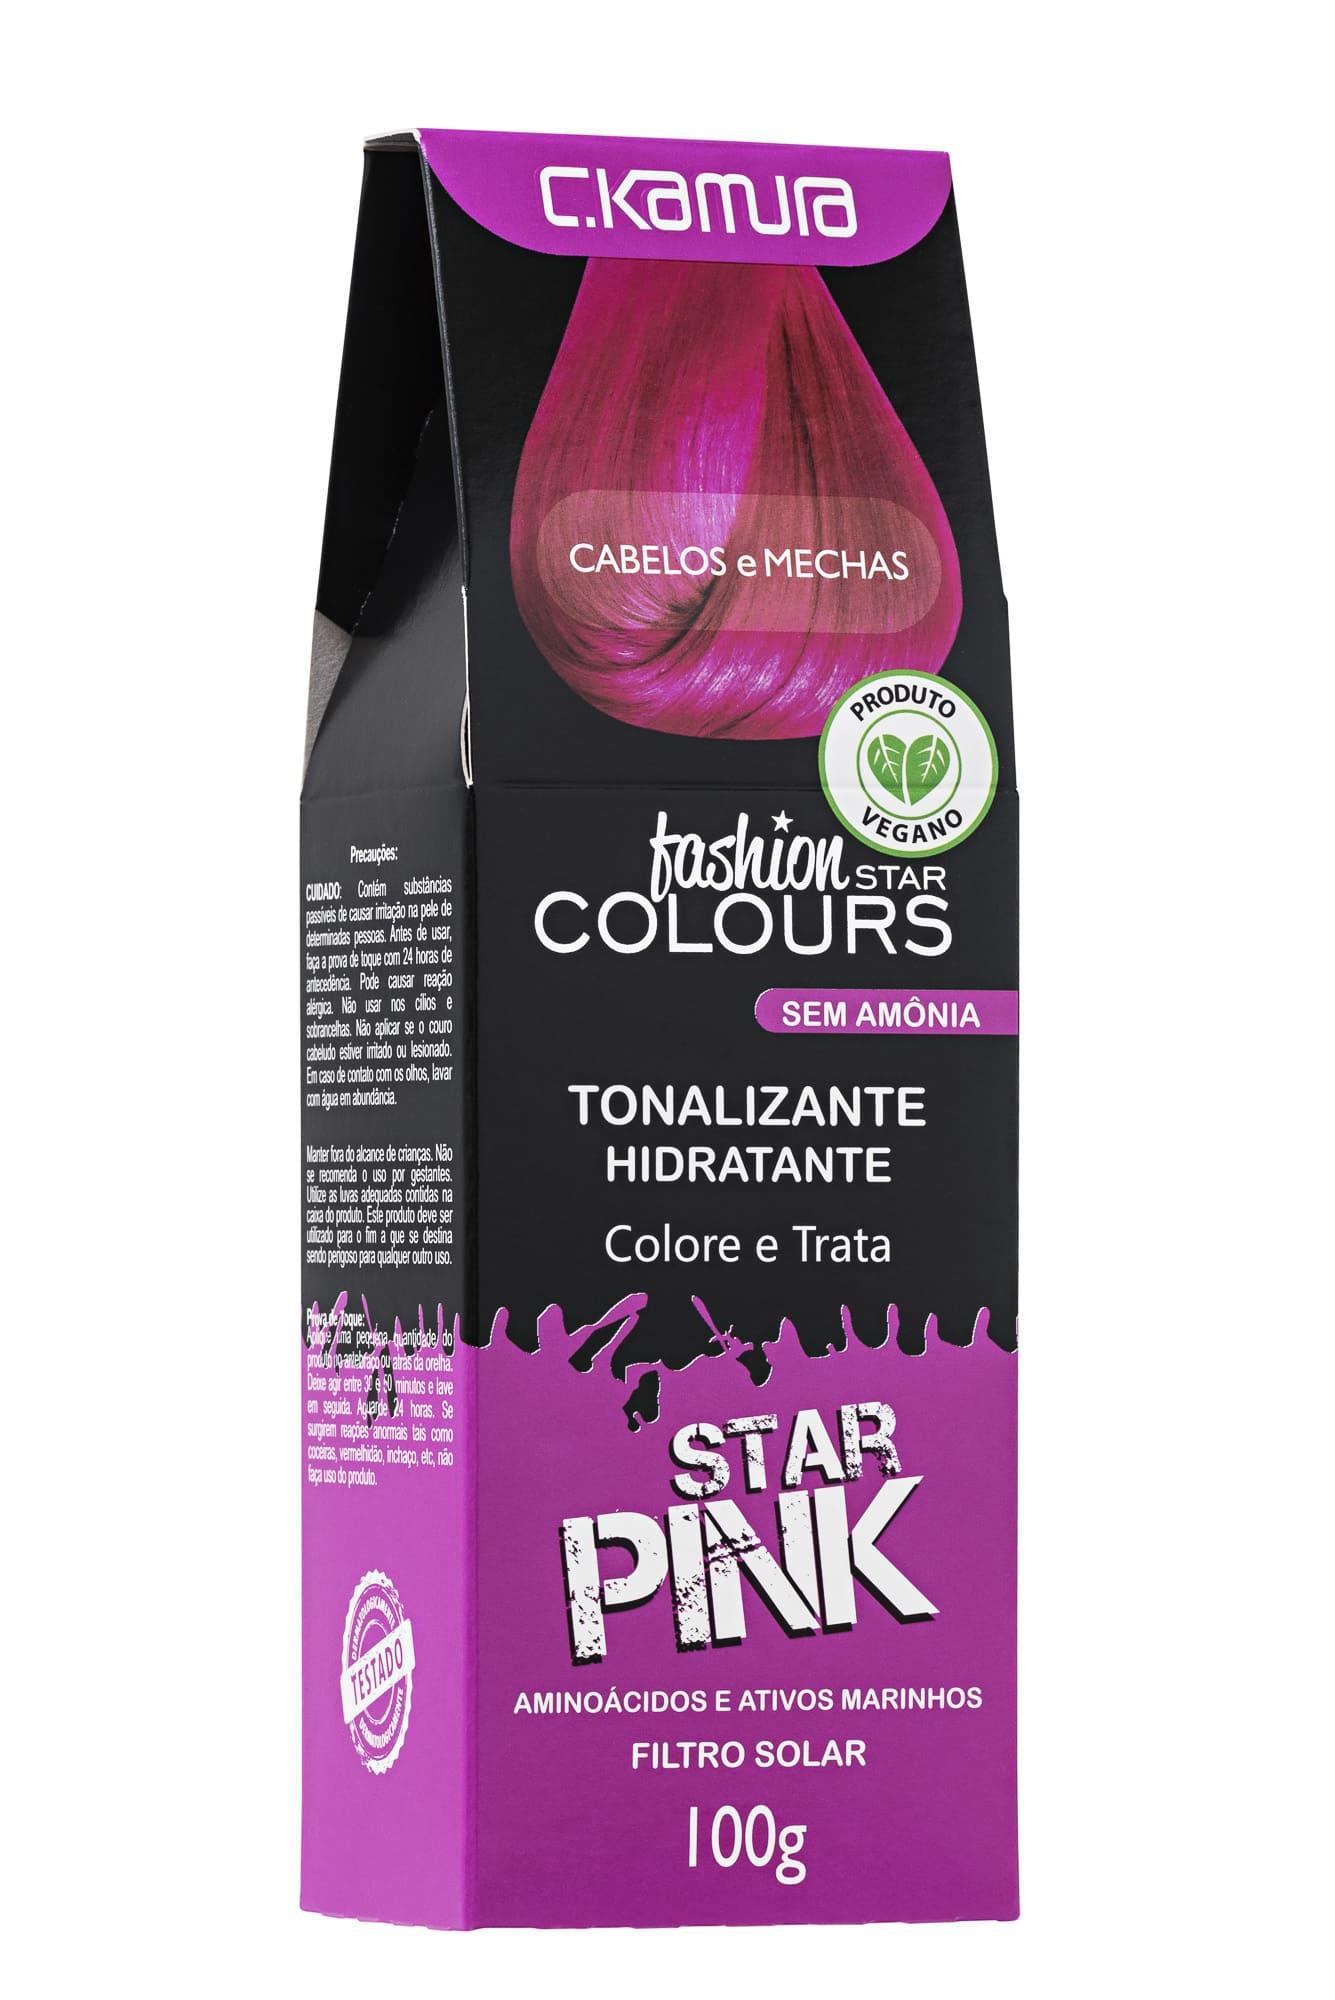 Tonalizante Star Pink Rosa Fashion Star Colours Ckamura